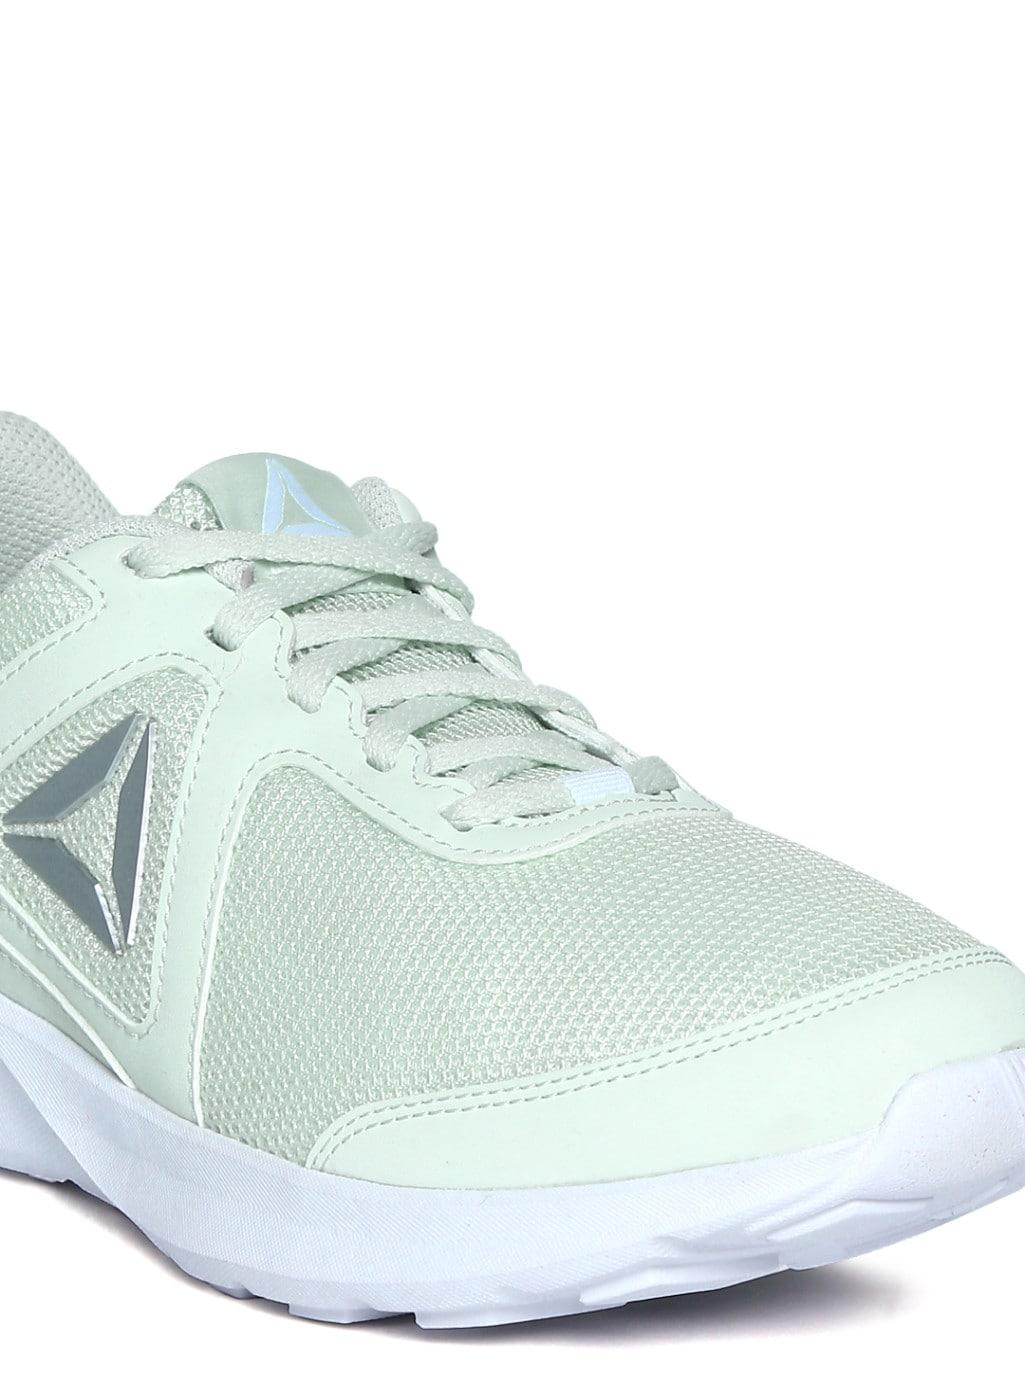 bcc2438e5 Reebok Women Shoes - Buy Reebok Women Shoes online in India - Jabong